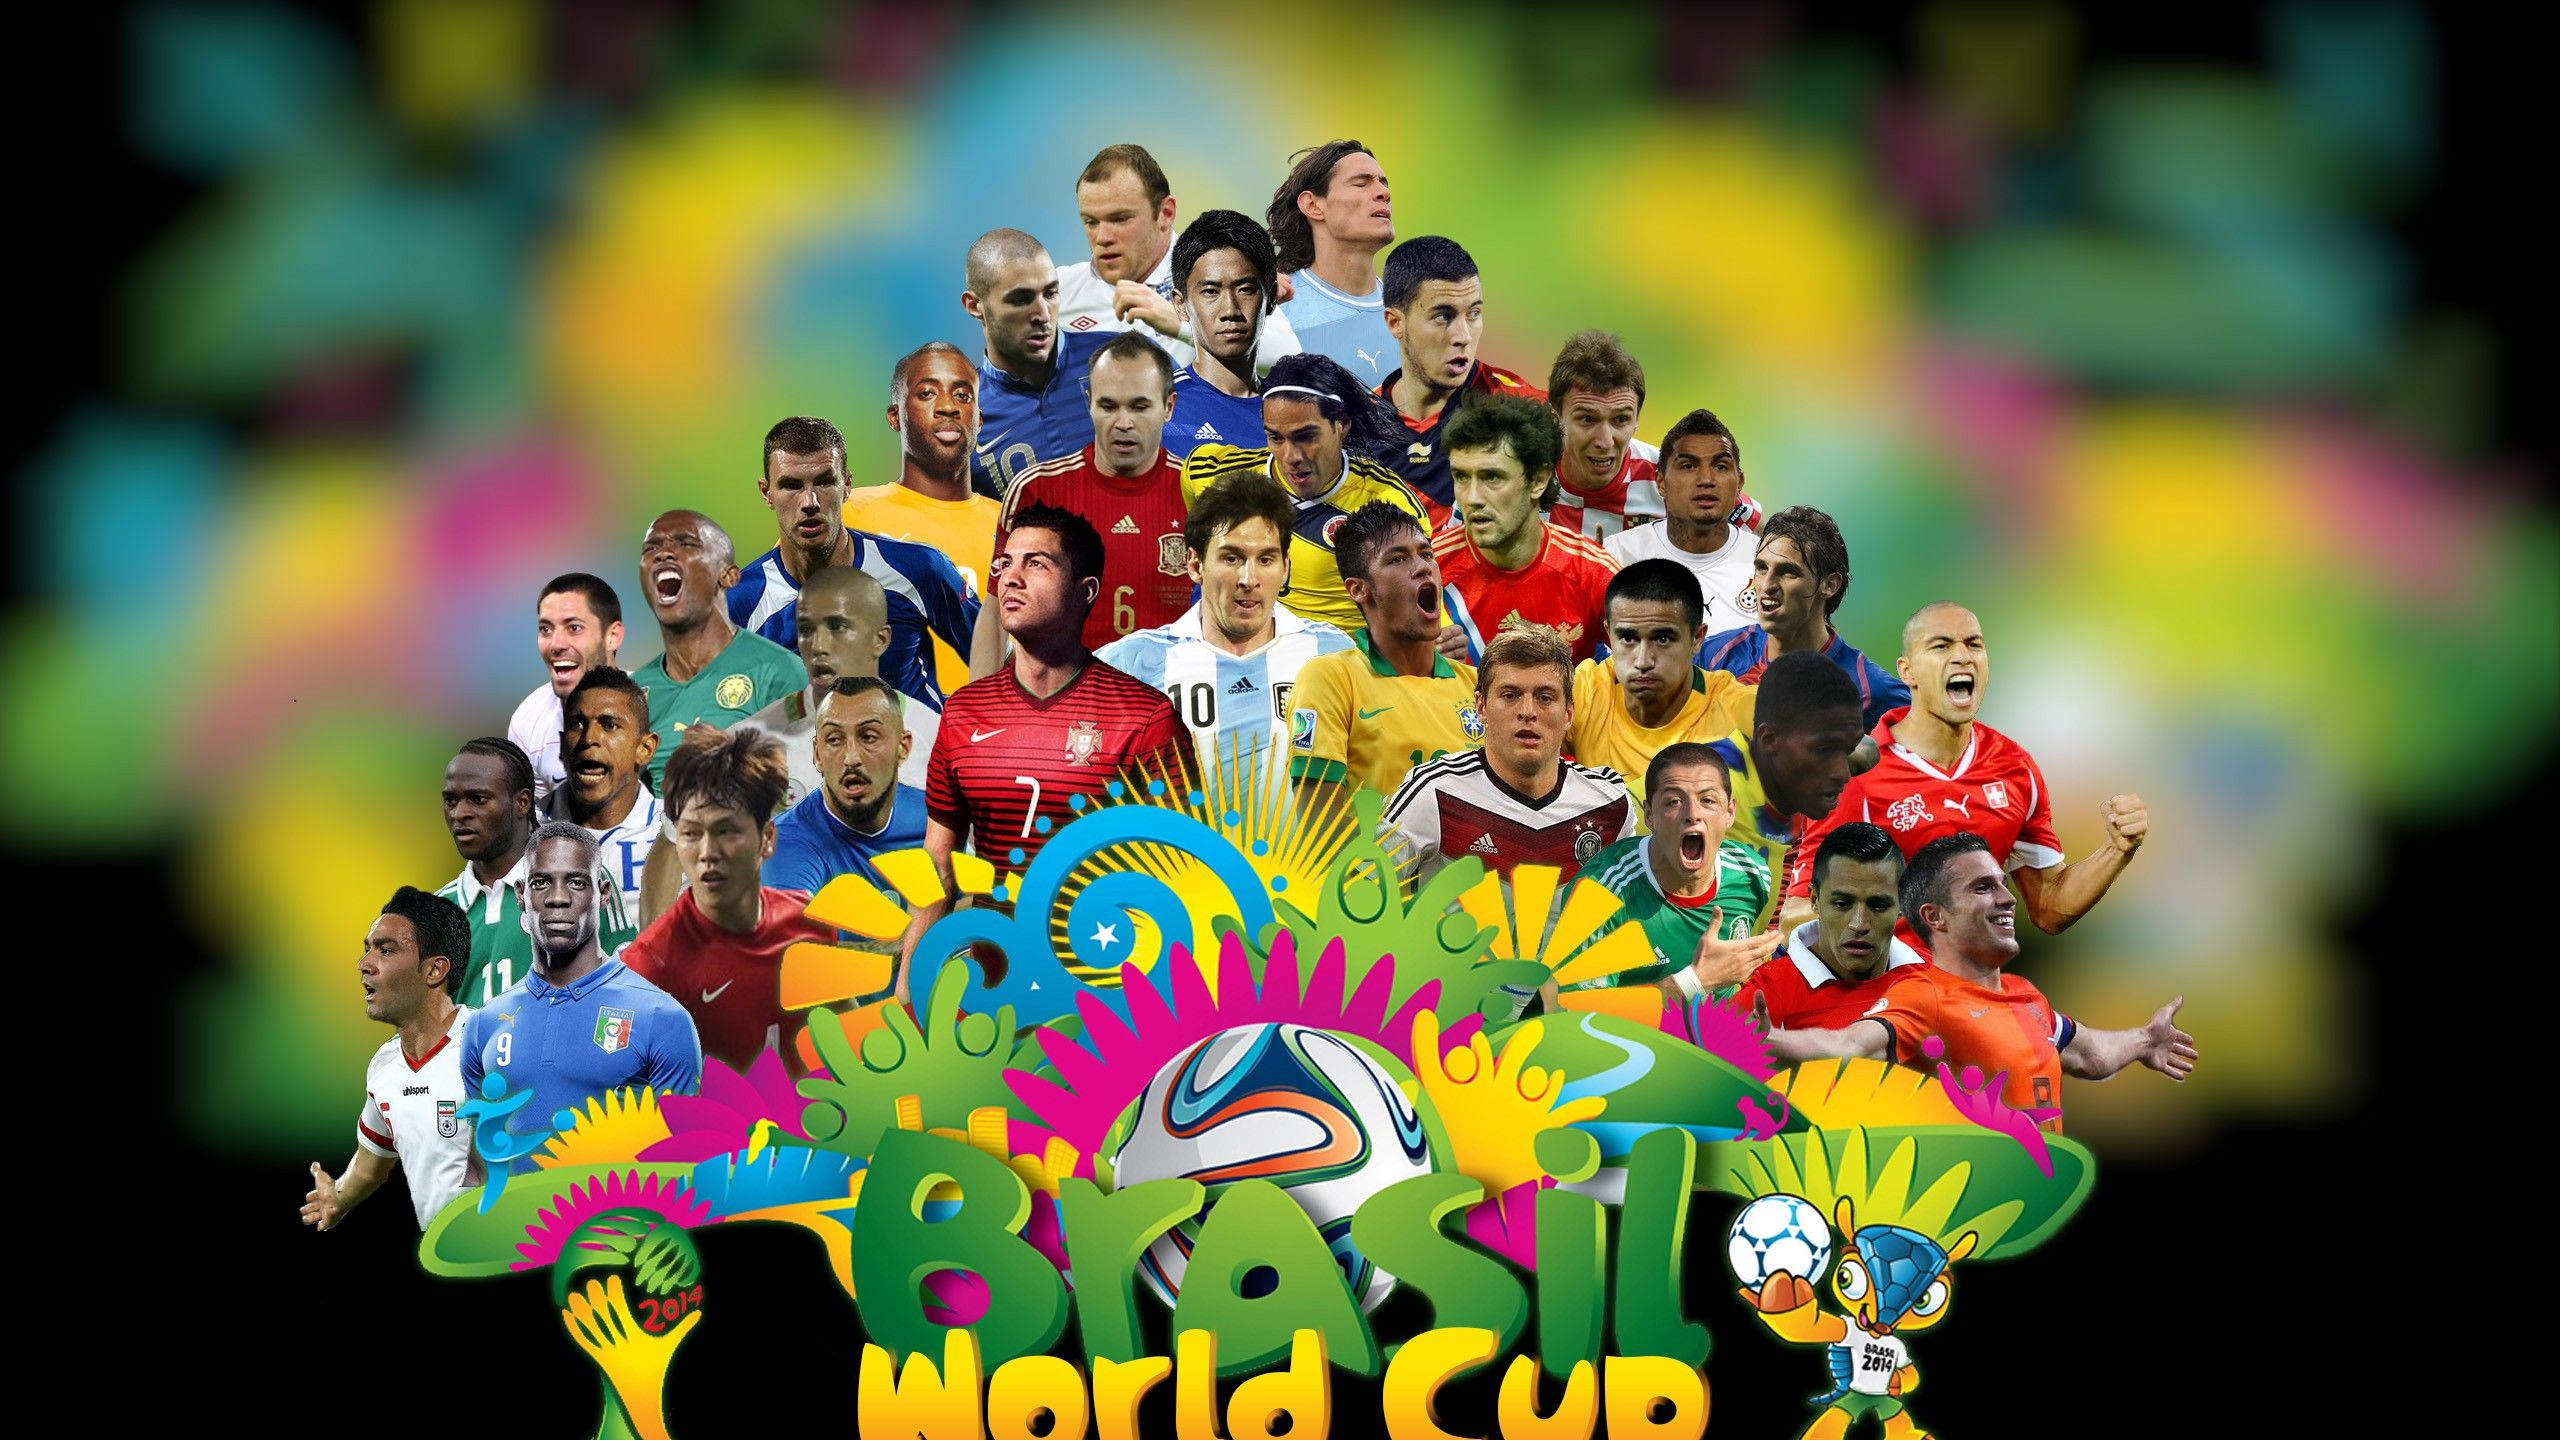 Pin by Sciberras on Soccer Brazil world cup, Fifa